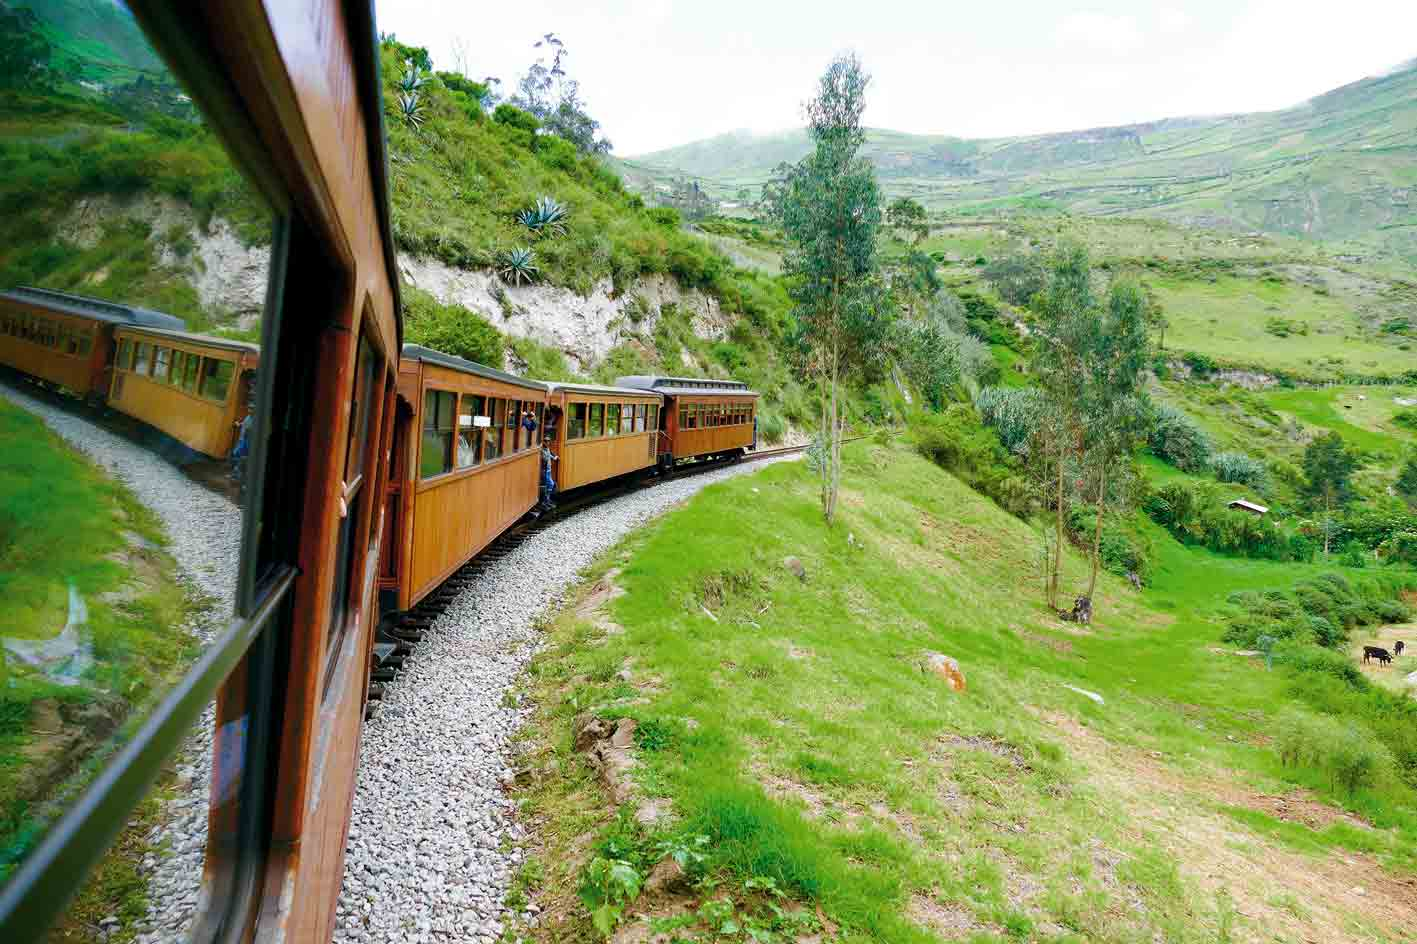 Zugfahrt zur Teufelsnase, Ecuador